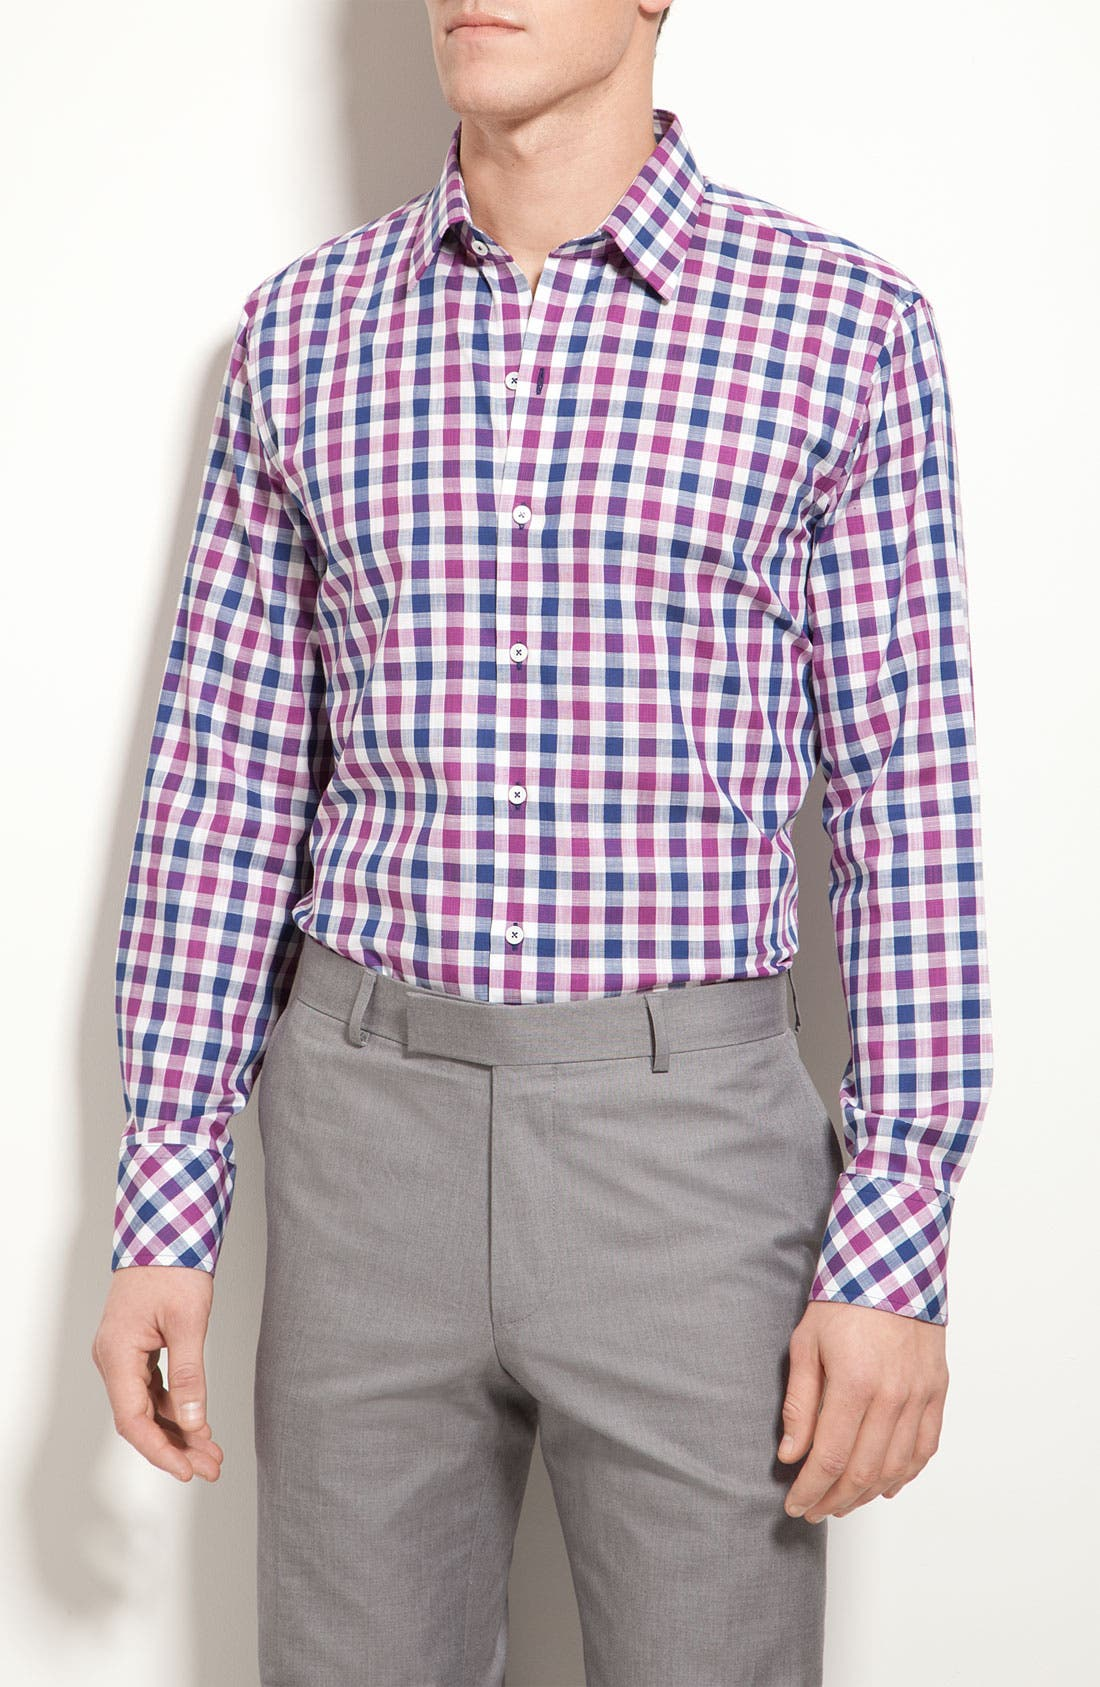 Alternate Image 1 Selected - Zachary Prell 'Jordan' Sport Shirt